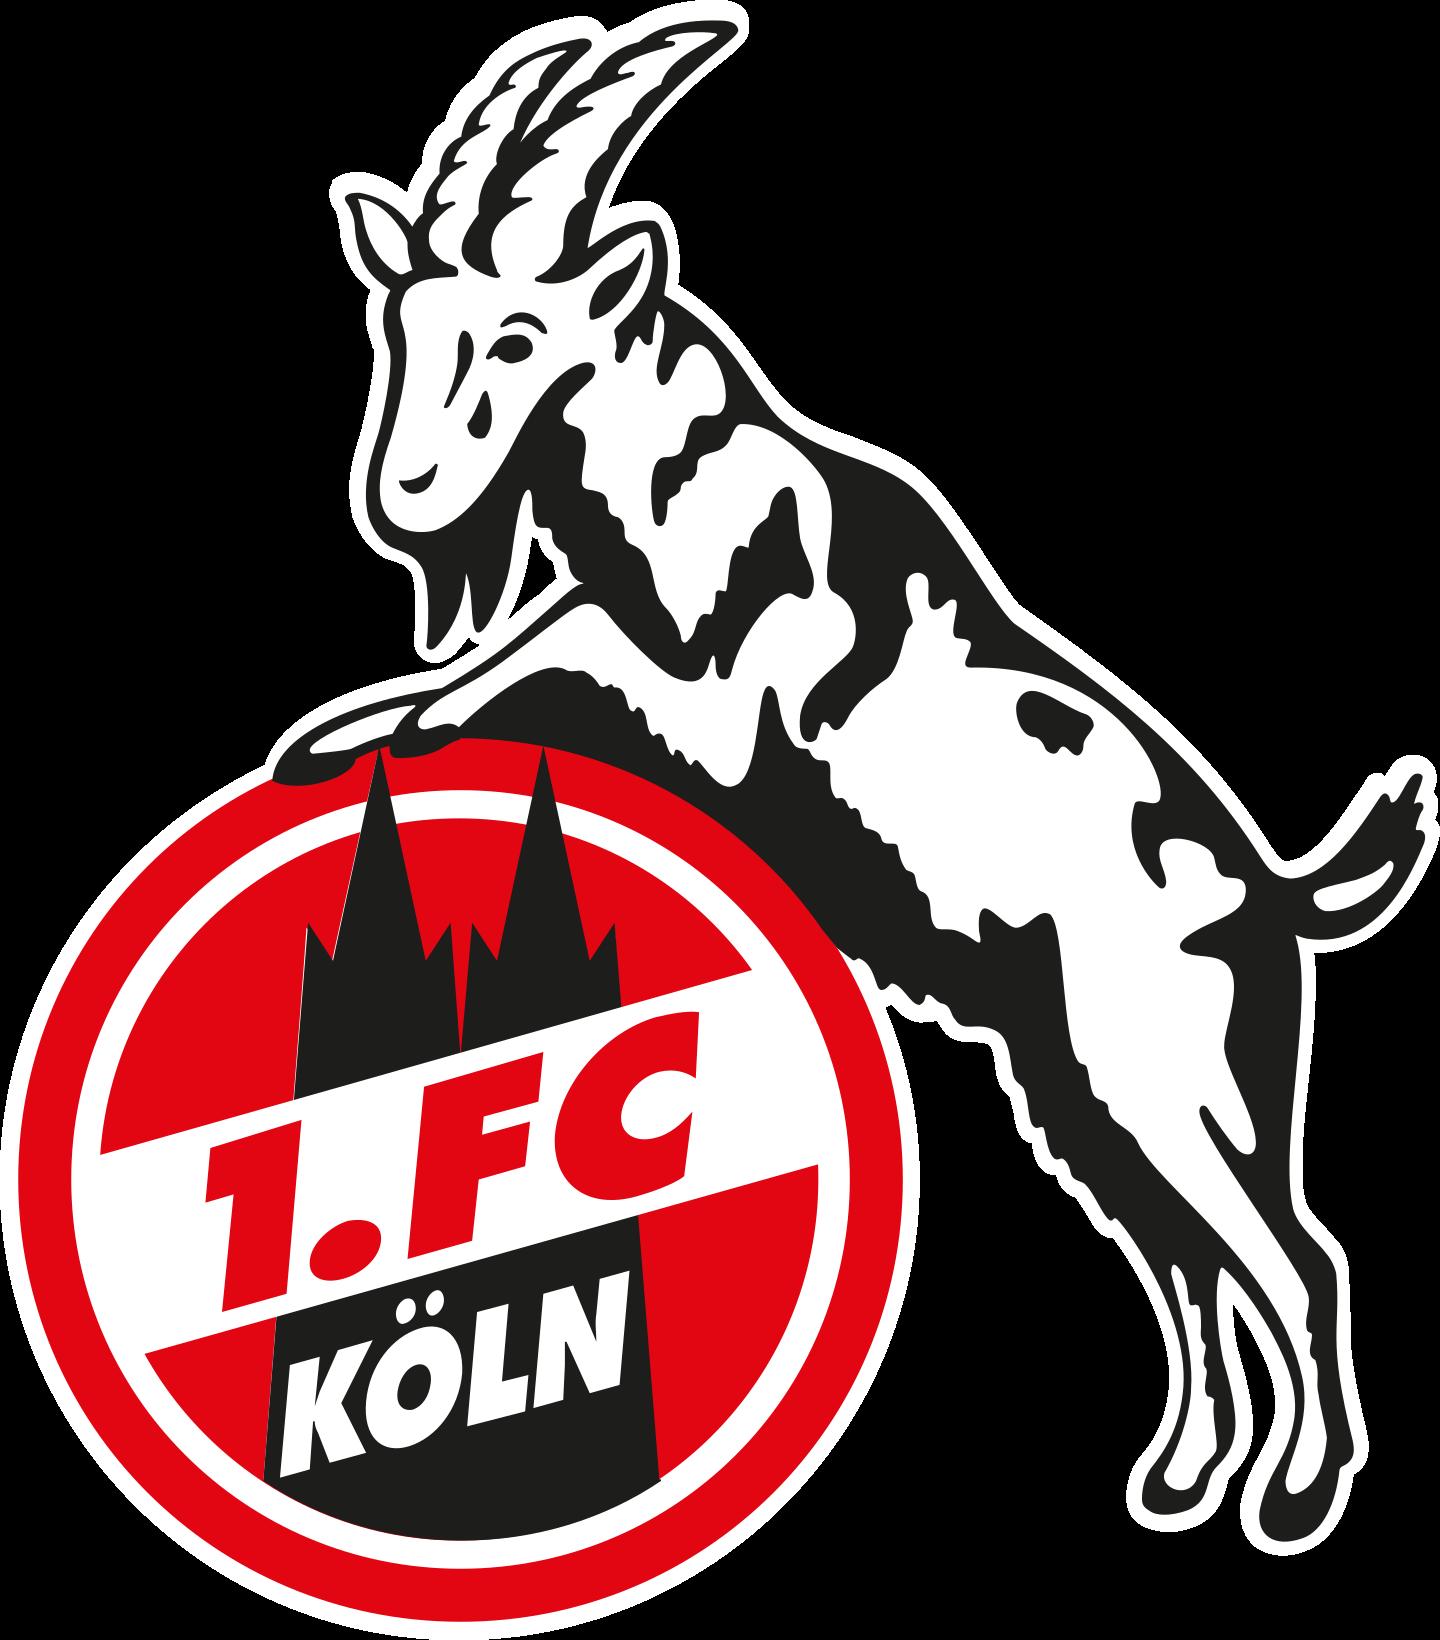 1 fc koln logo 2 - 1 FC Köln Logo